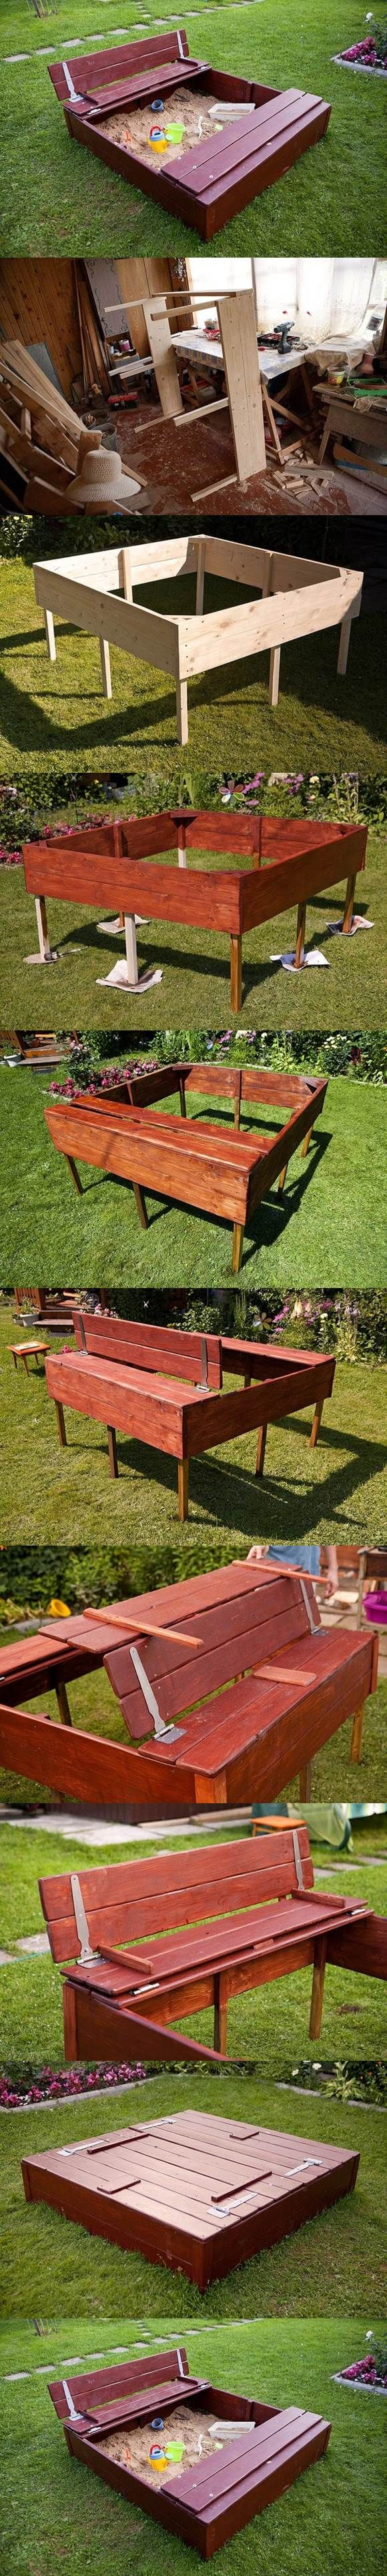 DIY Nice Sandbox for Kids | iCreativeIdeas.com LIKE Us on Facebook ==> https://www.facebook.com/icreativeideas